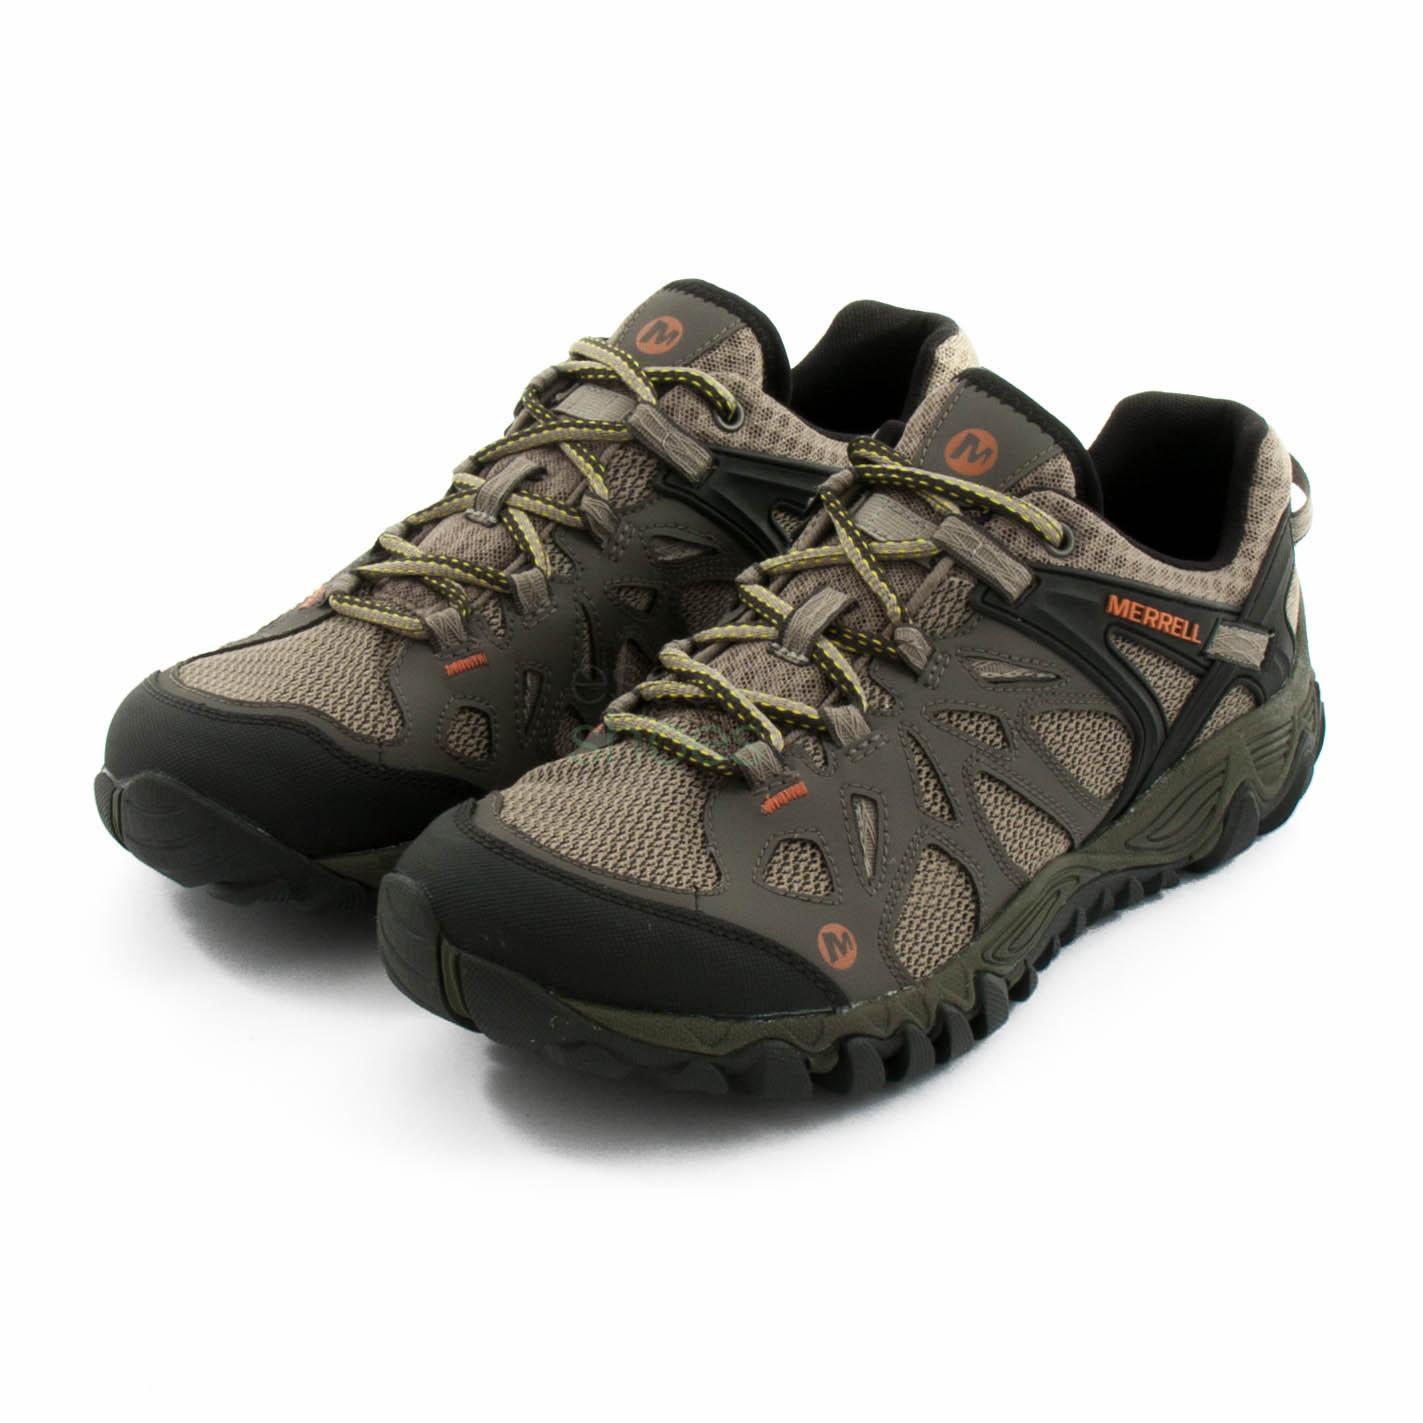 discount shop baby aliexpress Sneakers MERRELL All Out Blaze Aero Sport Khaki J32827